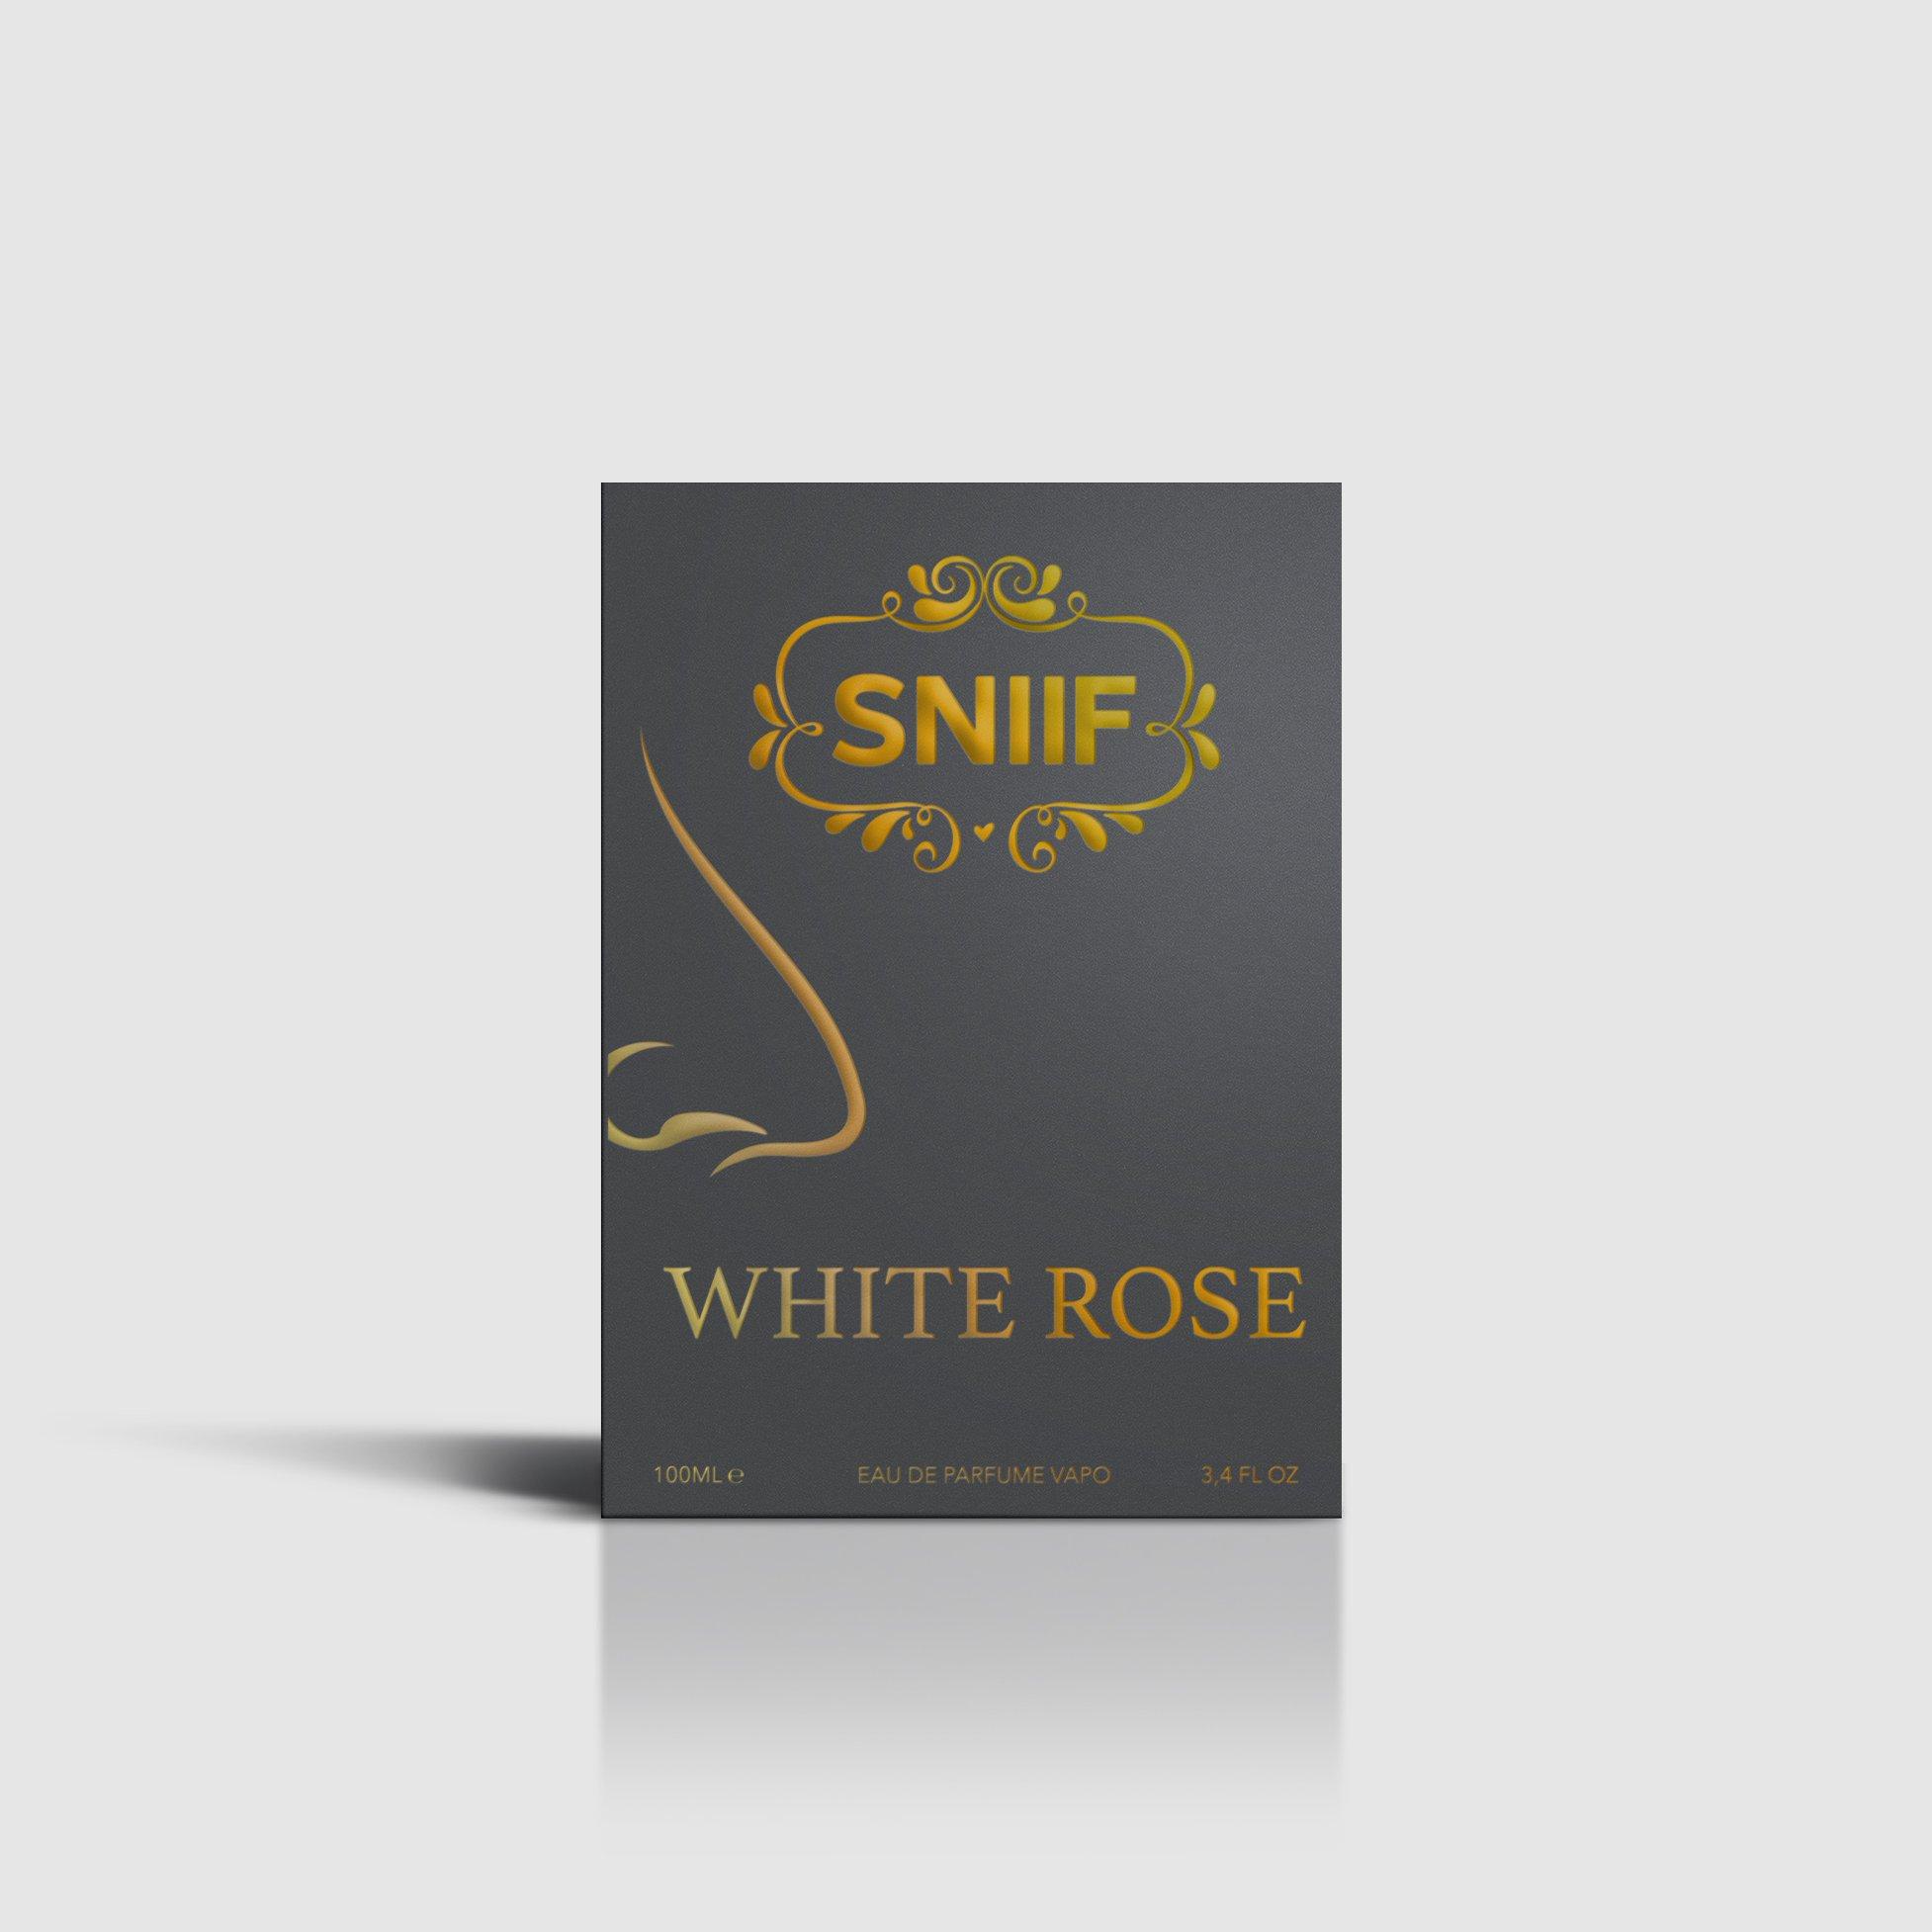 Sniif Profumo White Rose 100ml - Face Complex Cosmetics